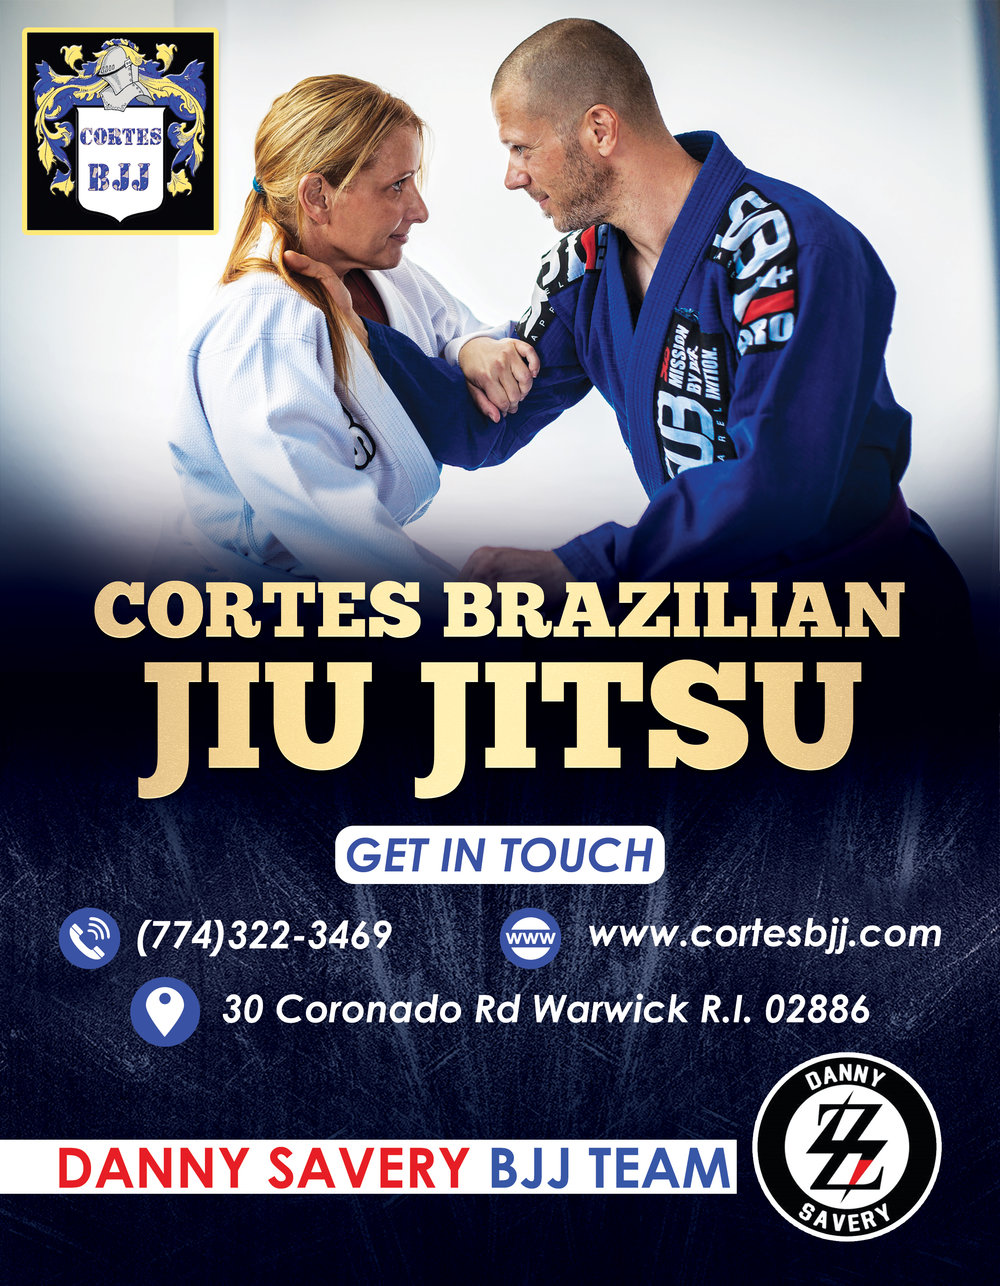 Cortes_Brazilian_Flyer.jpg